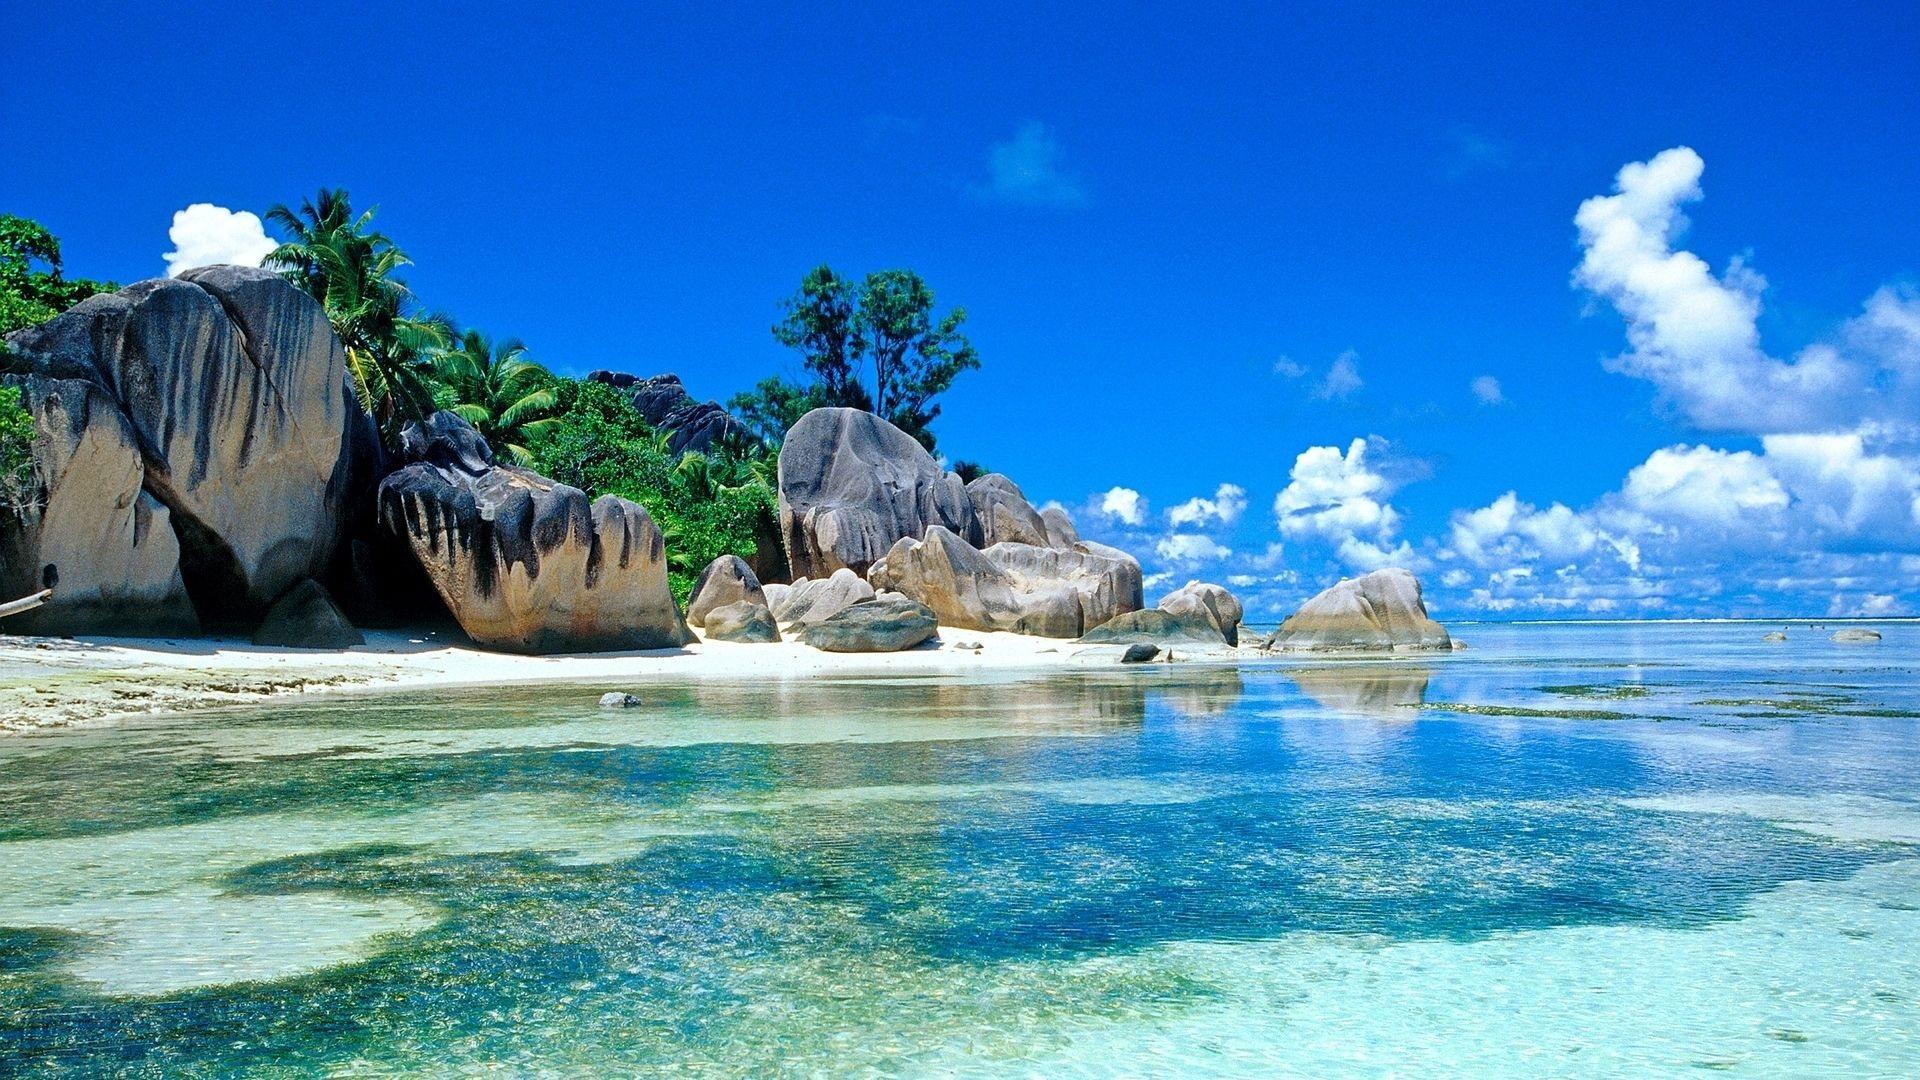 Beach paradise   landscape HD Wallpapers   Seychelles Paradise 1920x1080